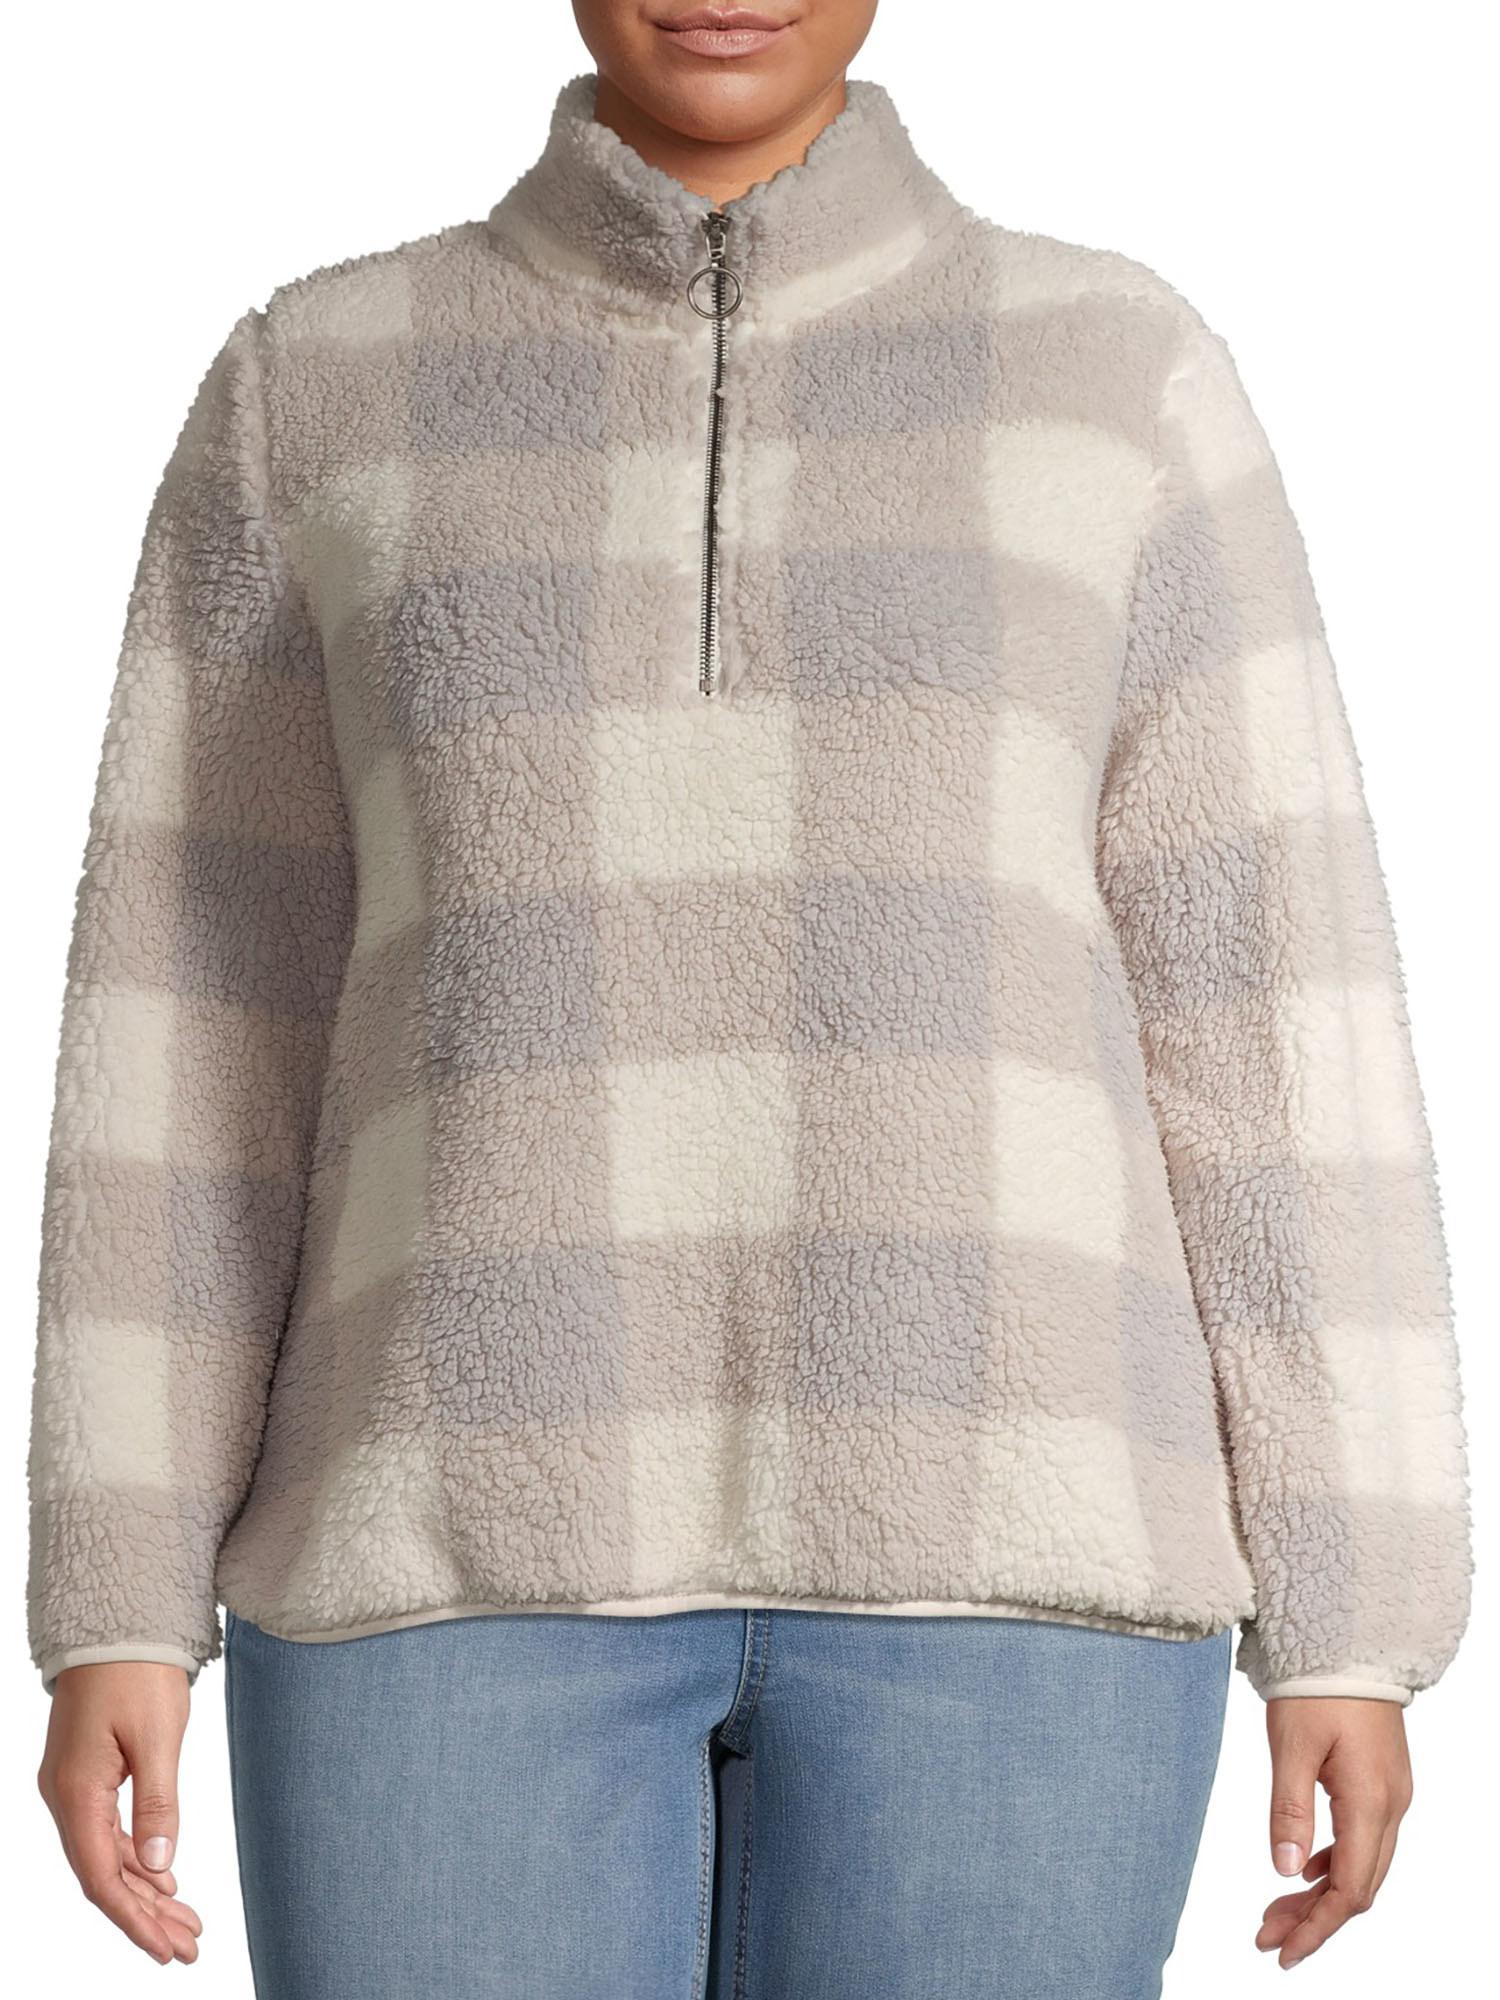 Model wears sherpa quarter zip in marshmallow check